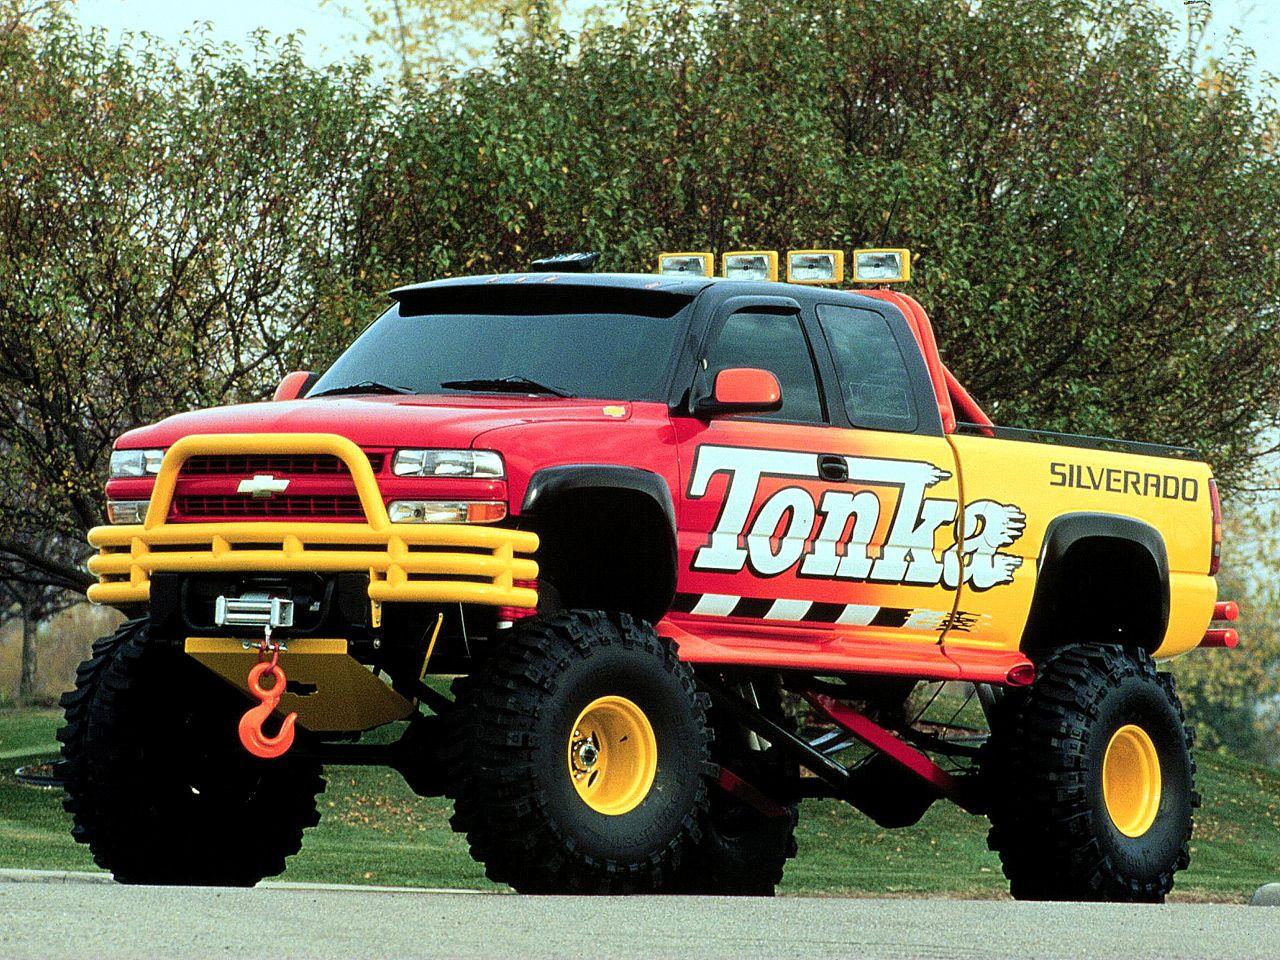 Truck chevy concept truck : Chevrolet Silverado Tonka Truck Concept ( sorta